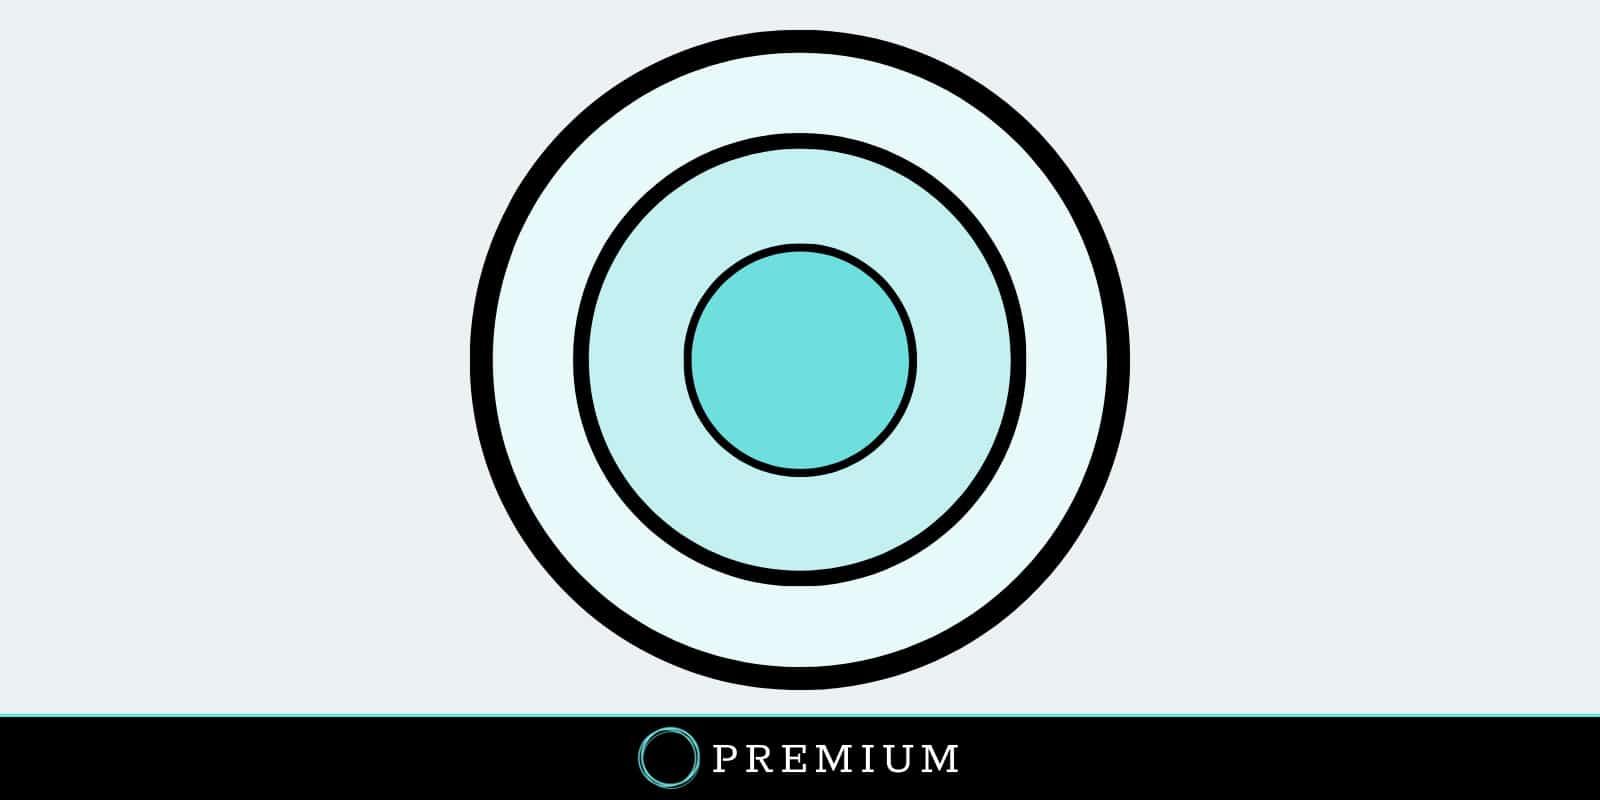 Sloww Golden Circle Simon Sinek Behavior Change James Clear Premium